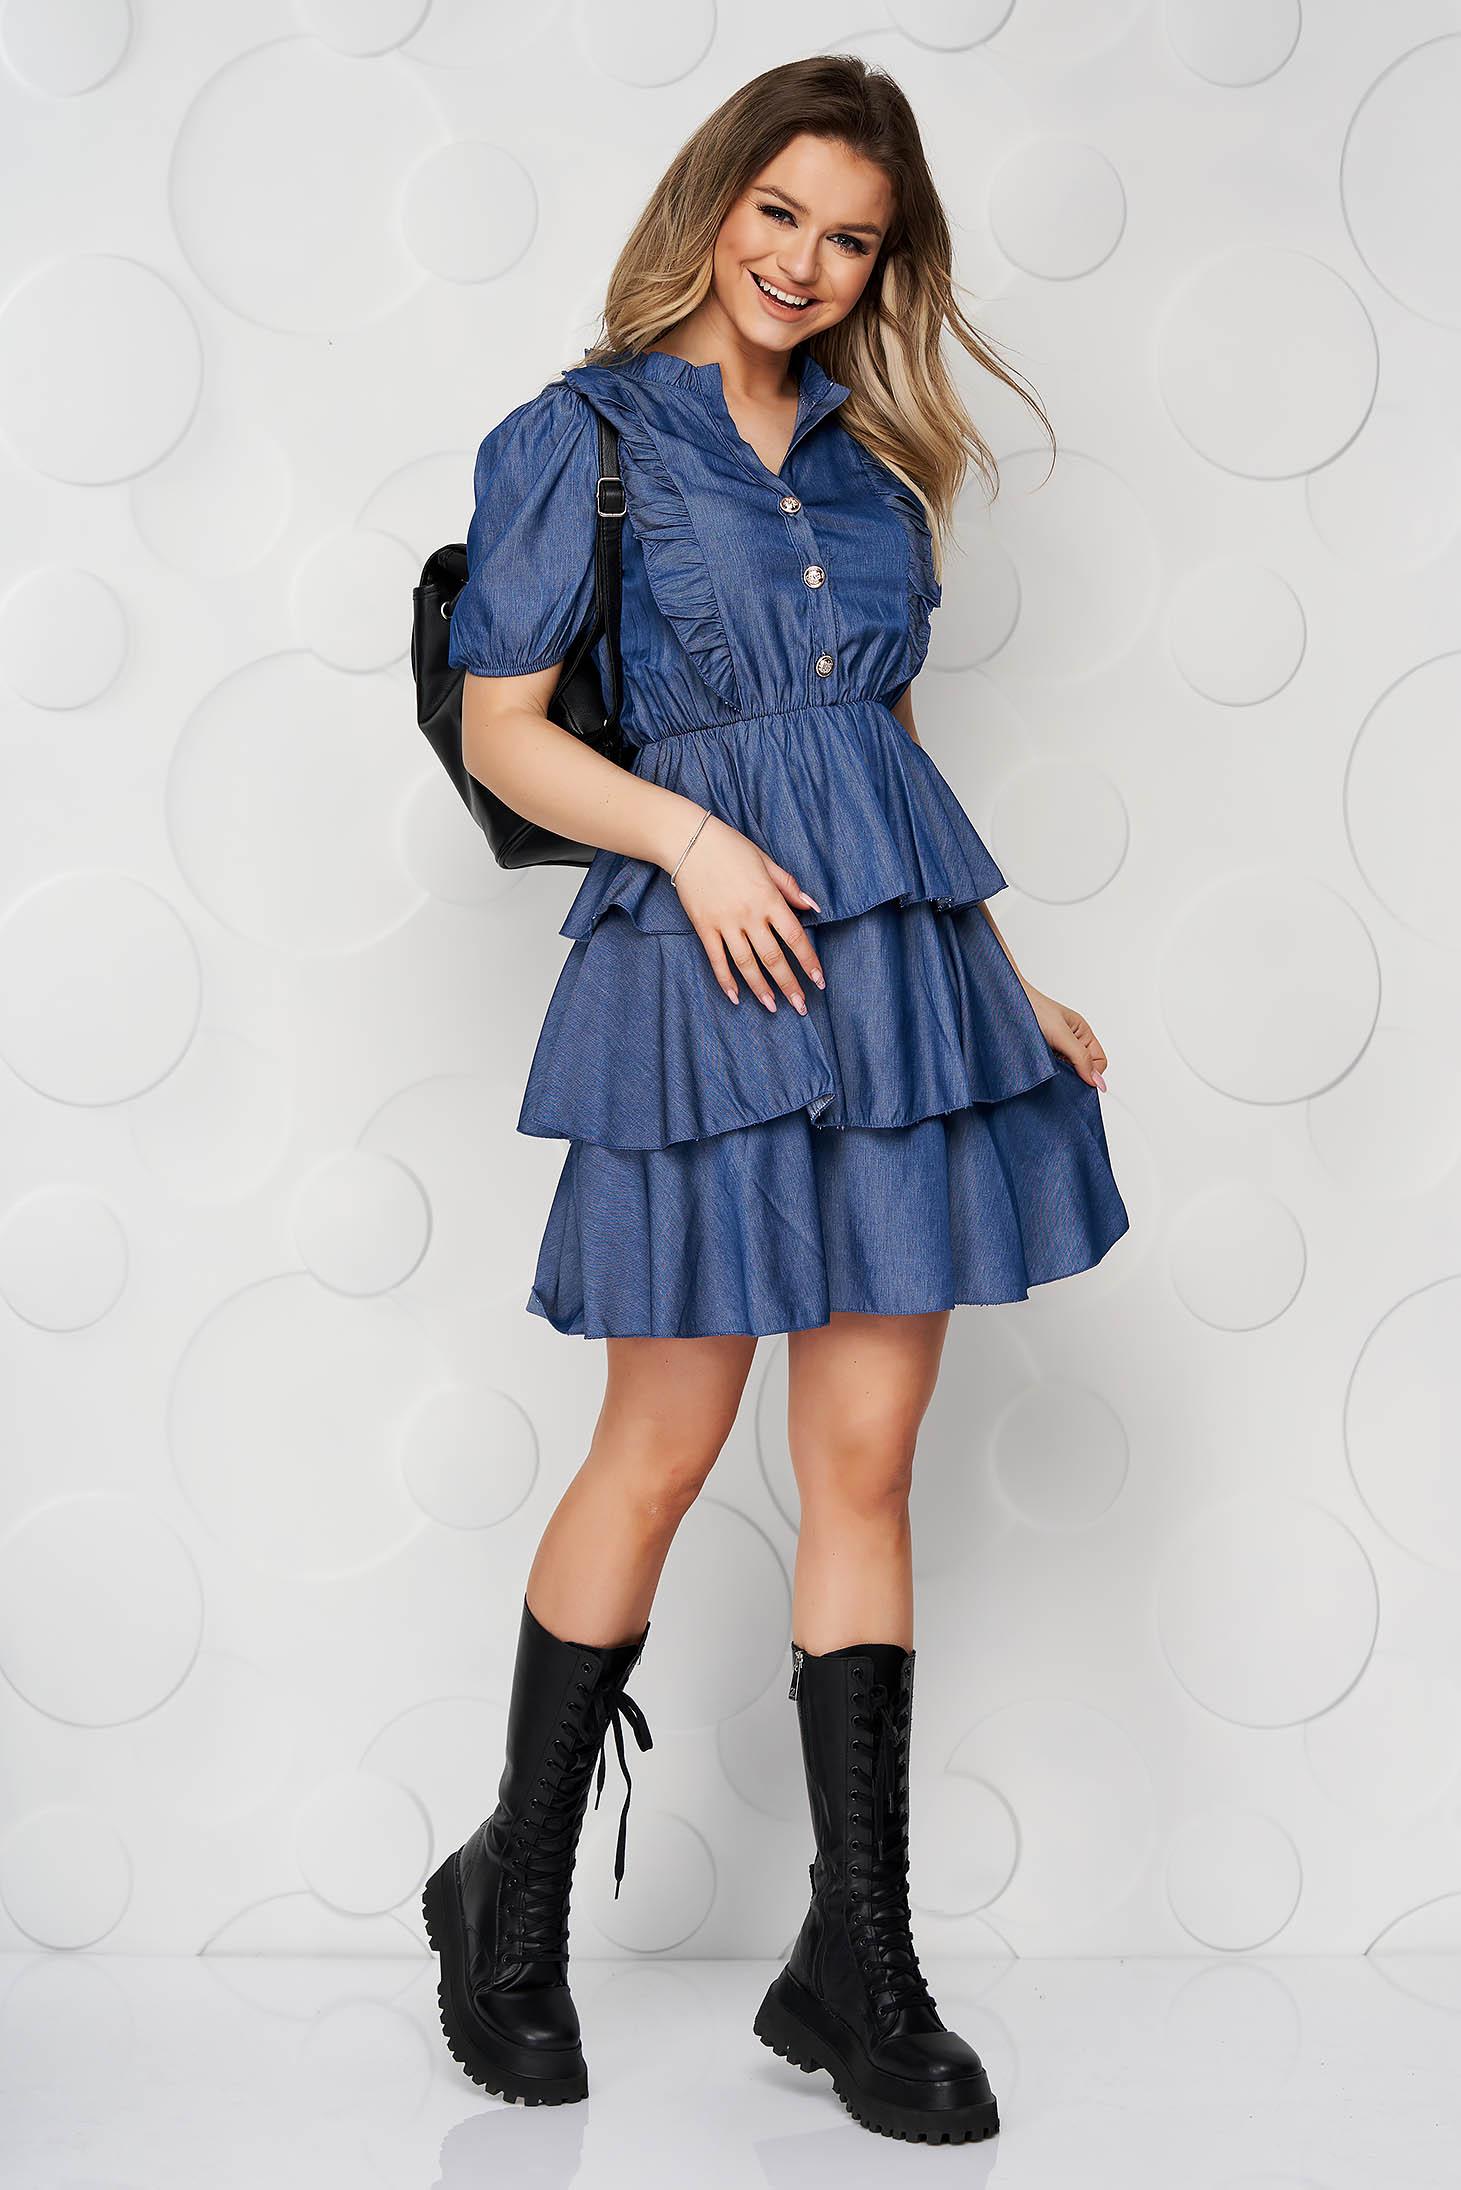 Darkblue dress short cut daily cloche denim with ruffle details